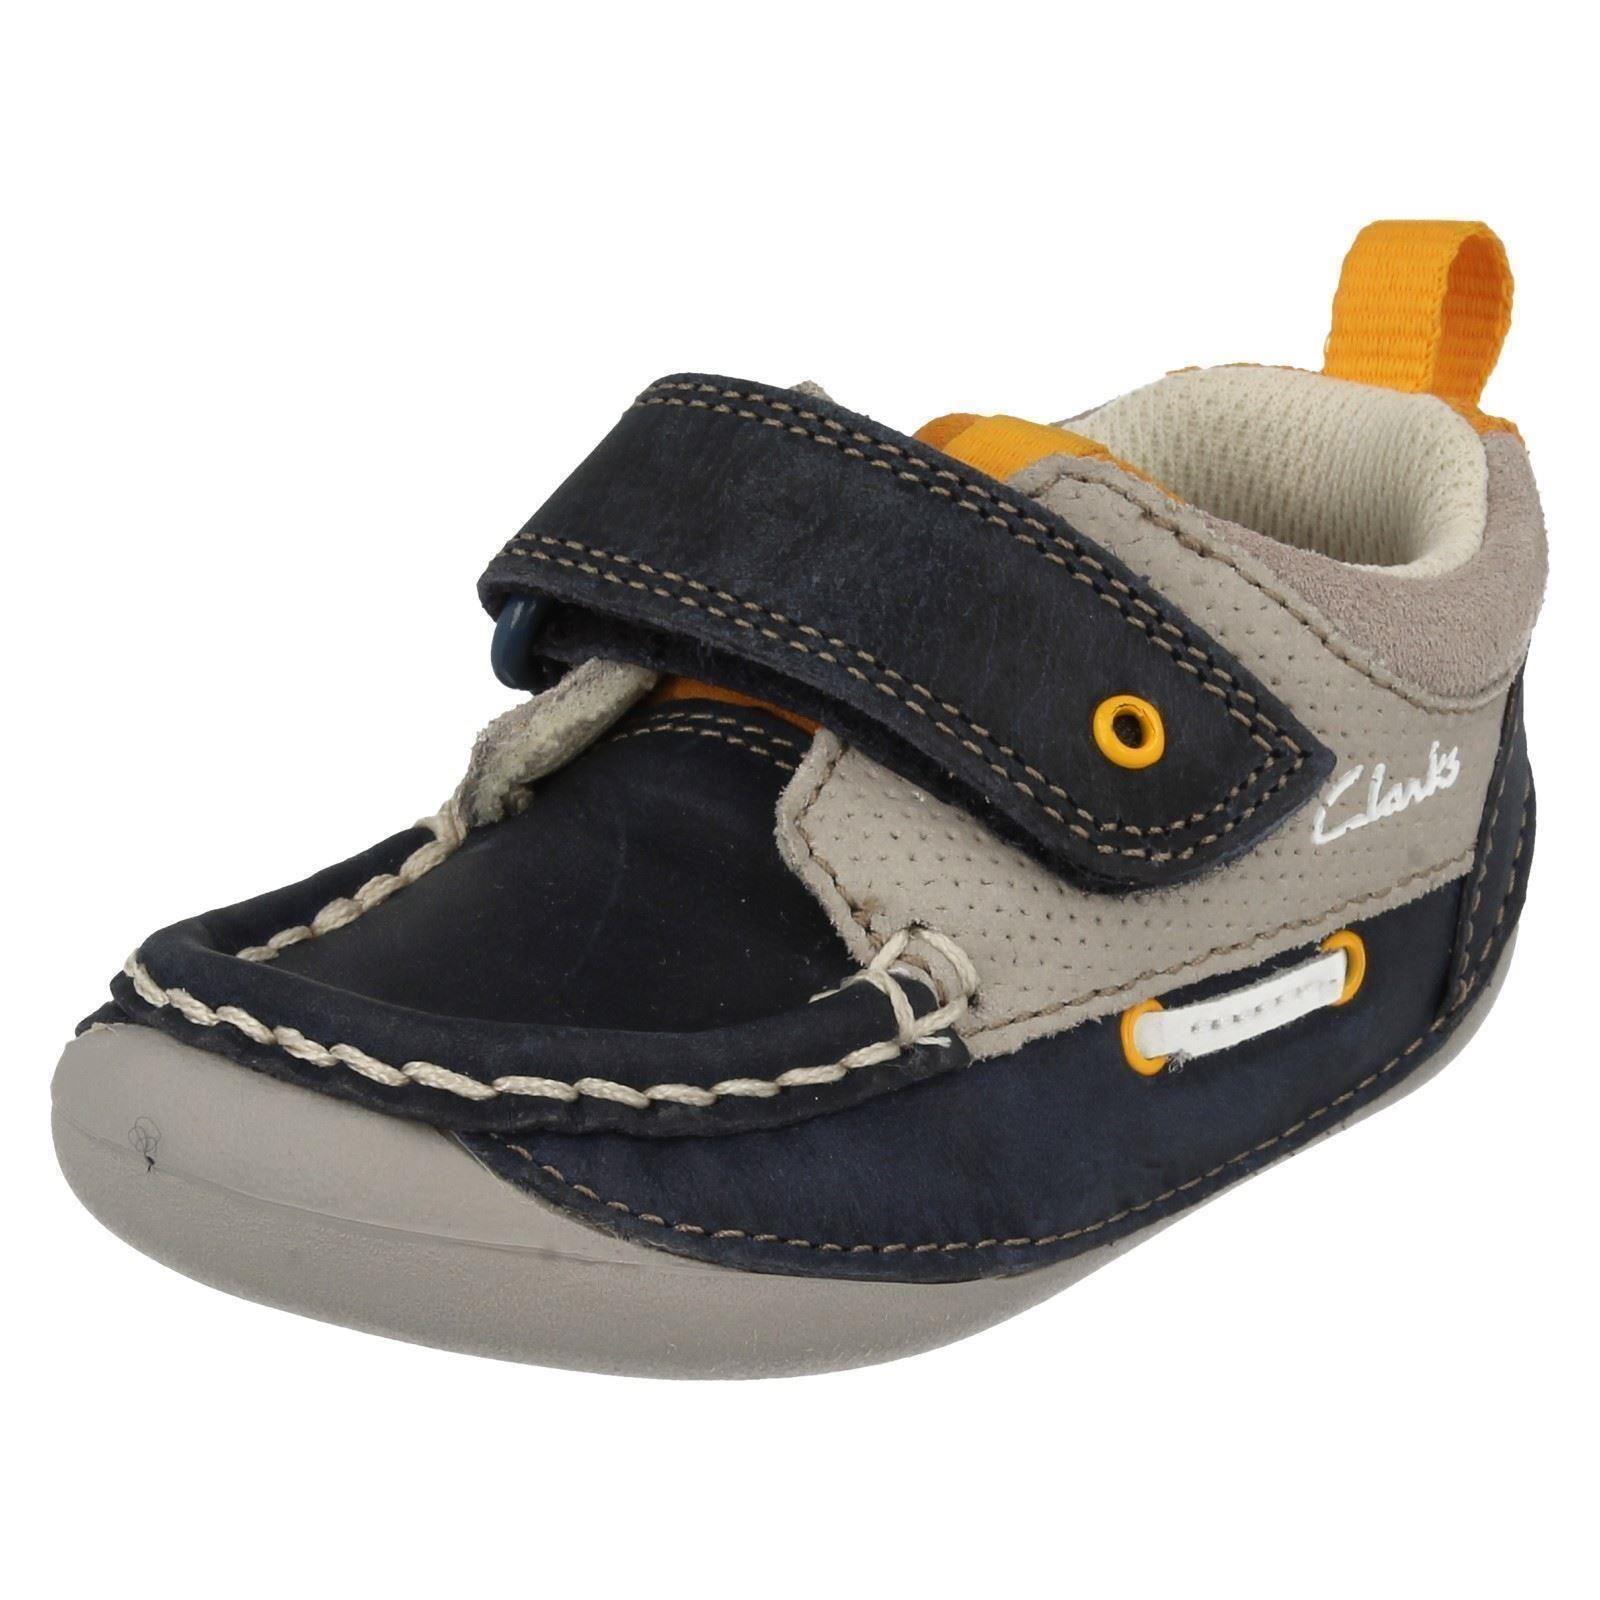 Zapatos Clarks chicos CRUISER CRUISER Cubierta